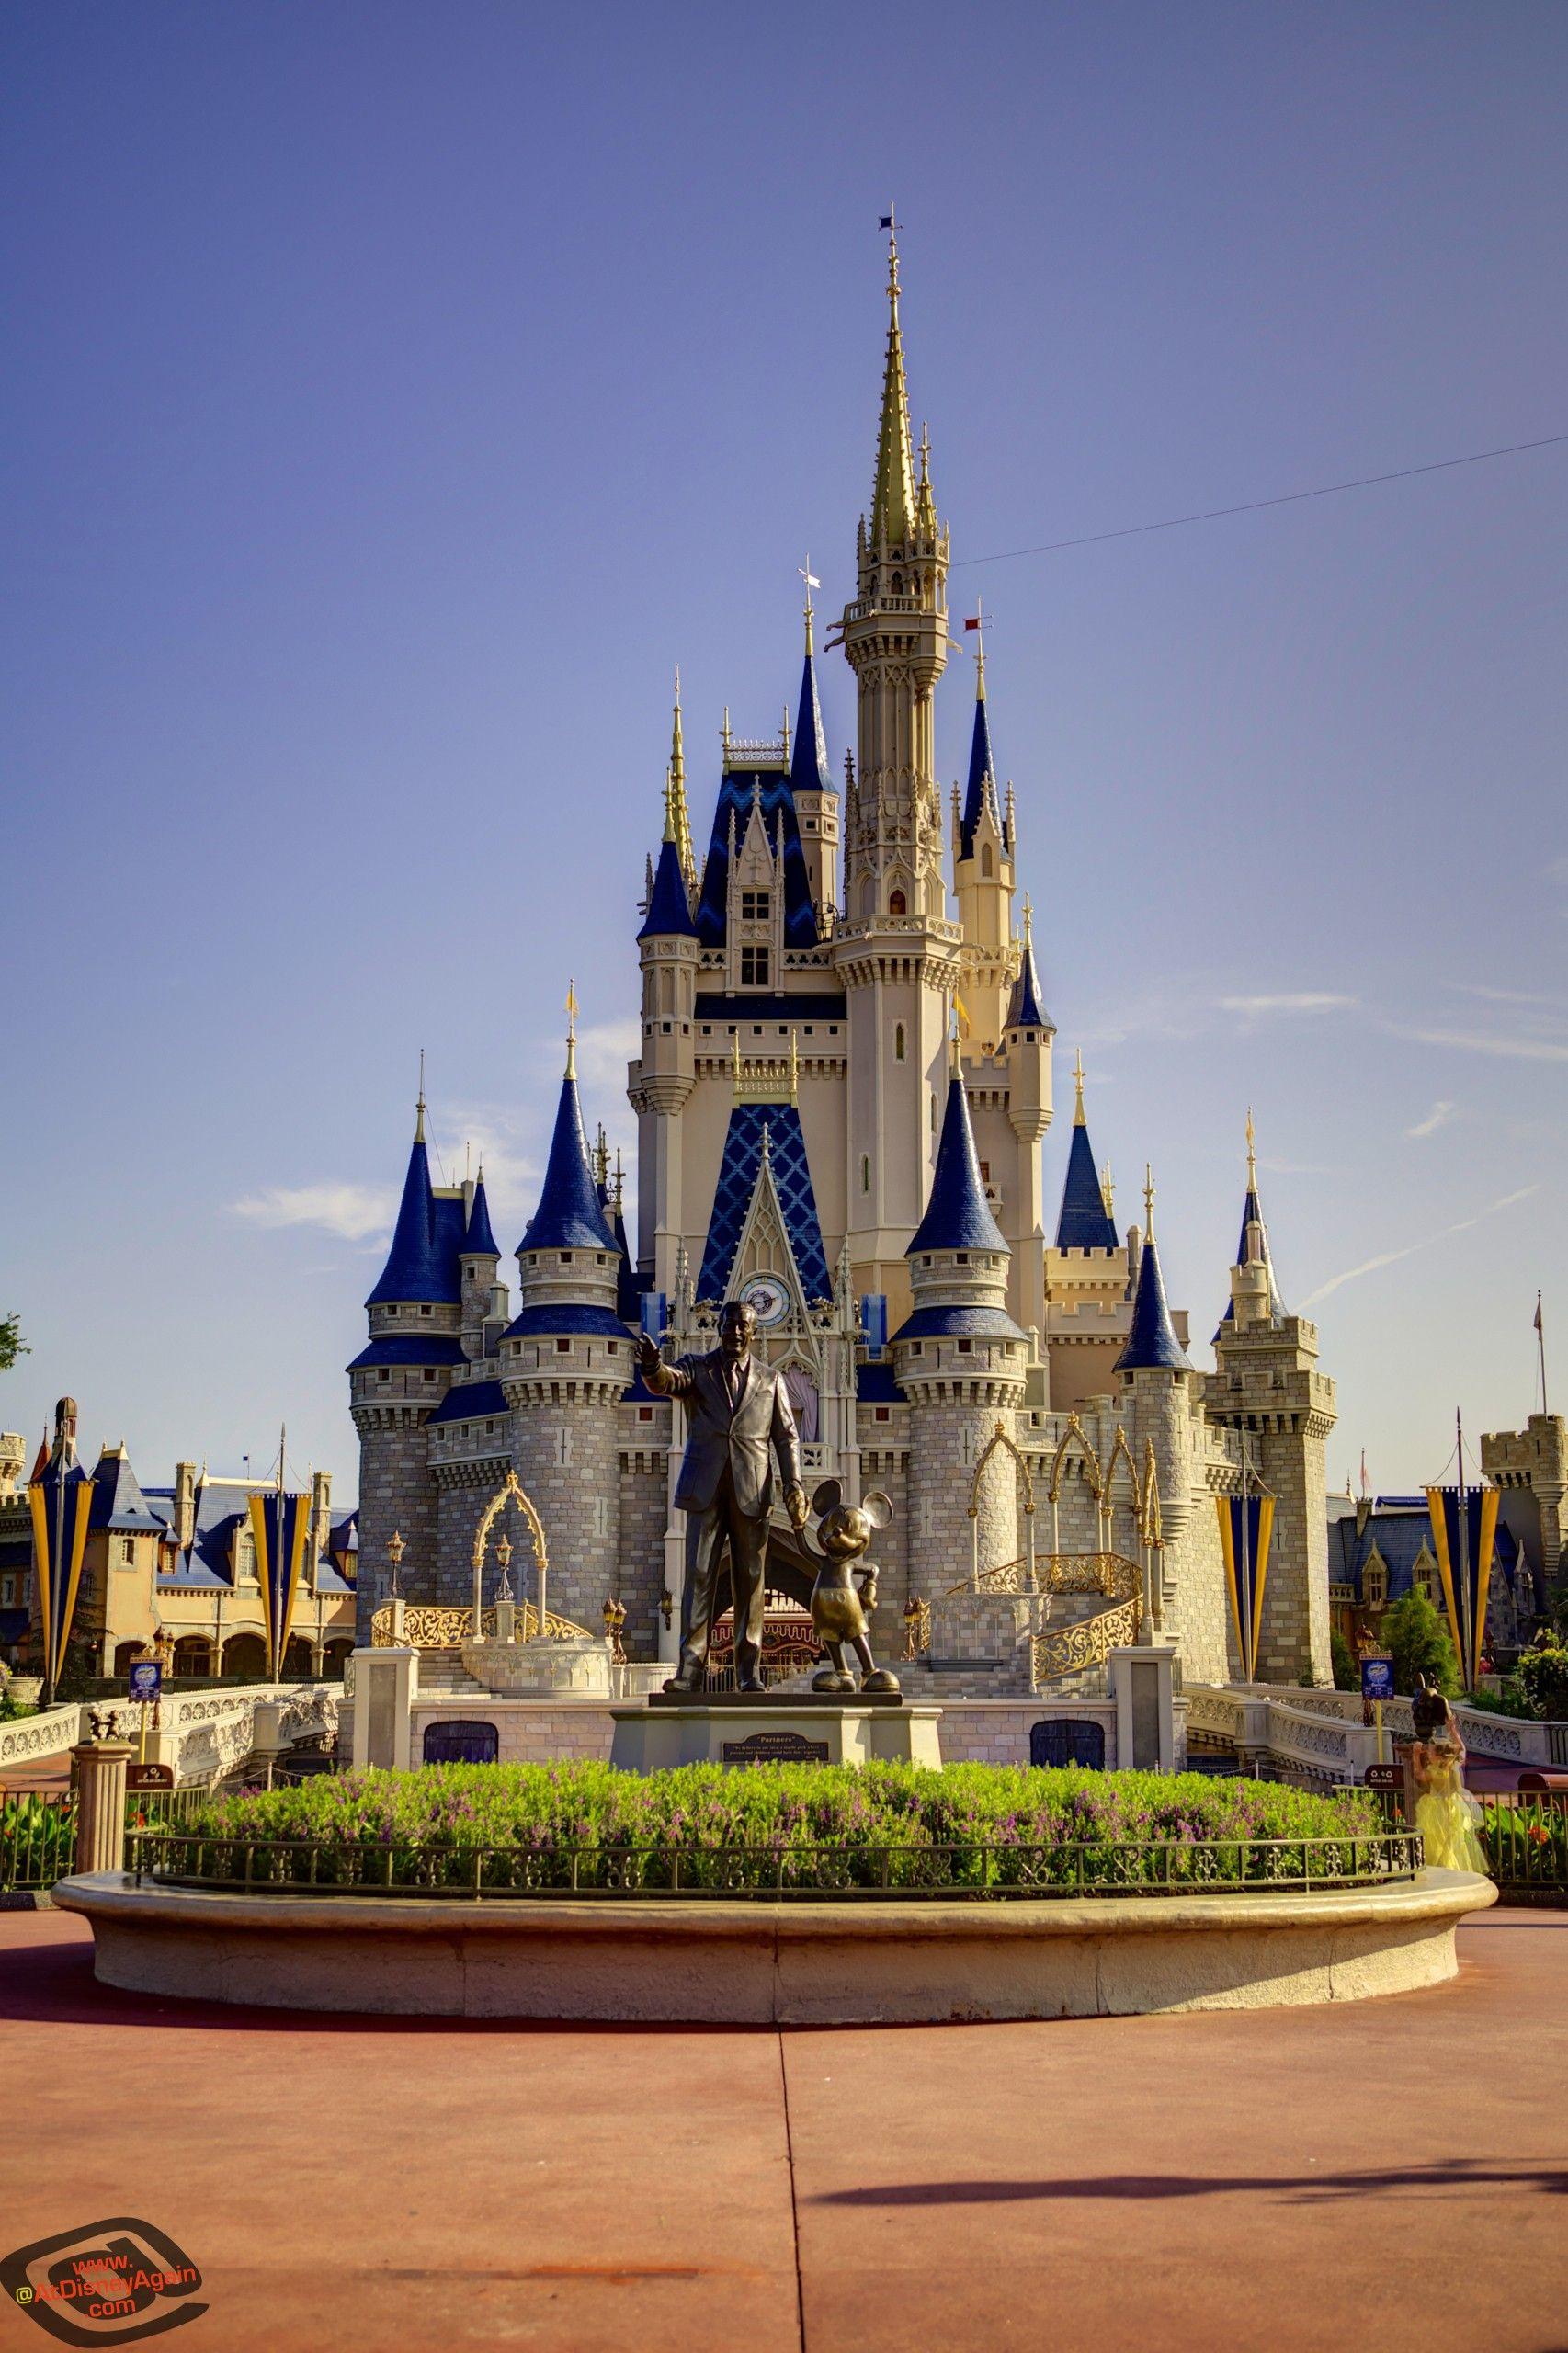 Daytime Cinderella Castle Wallpaper 026 Disney World Castle Disney Castle Disney Wallpaper